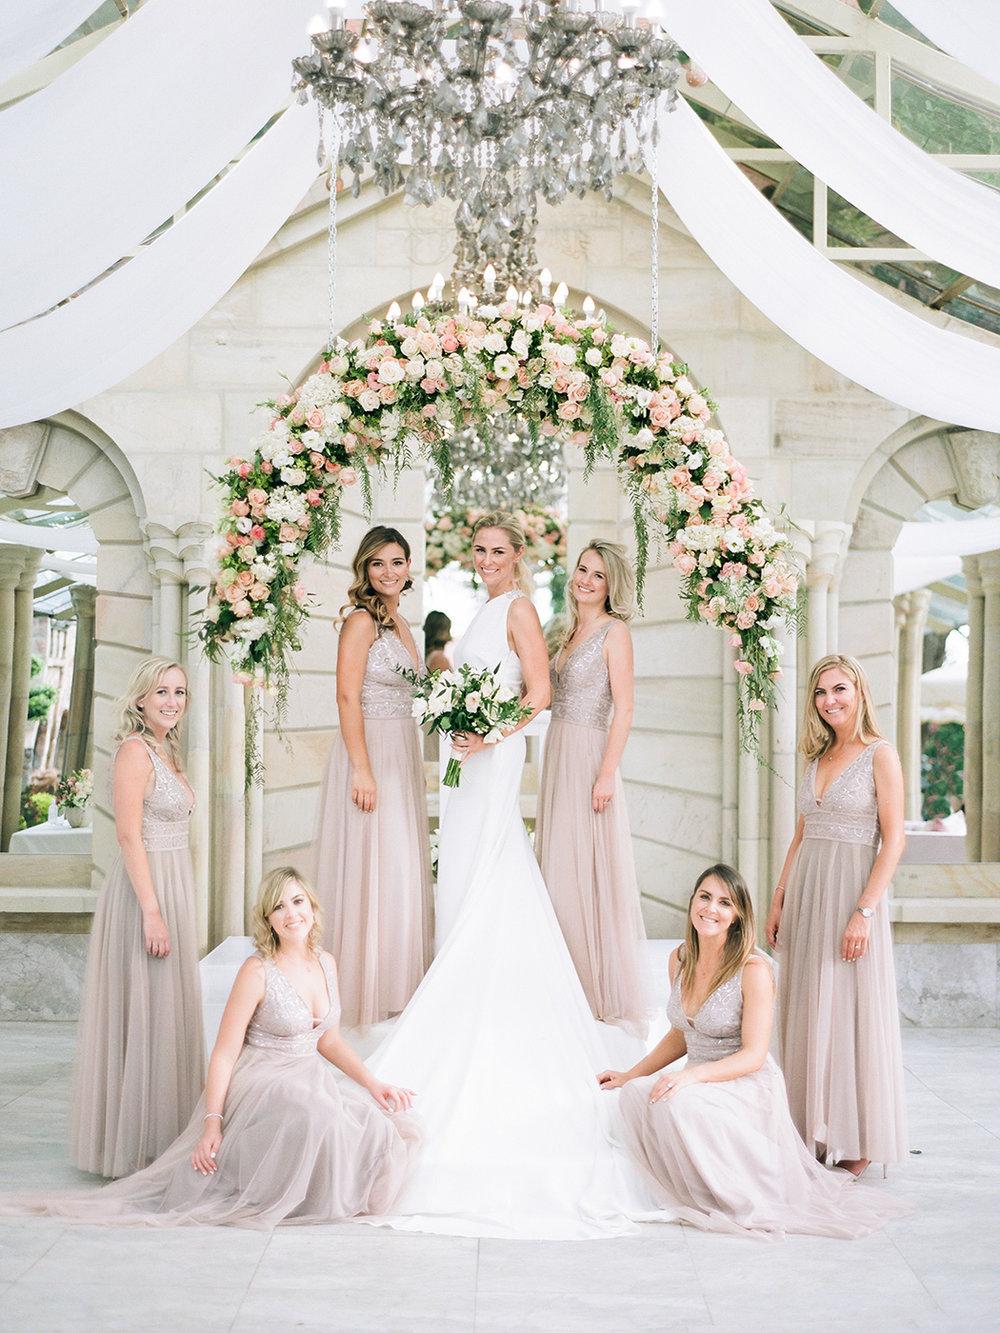 Bridal Party | Rensche Mari Photography